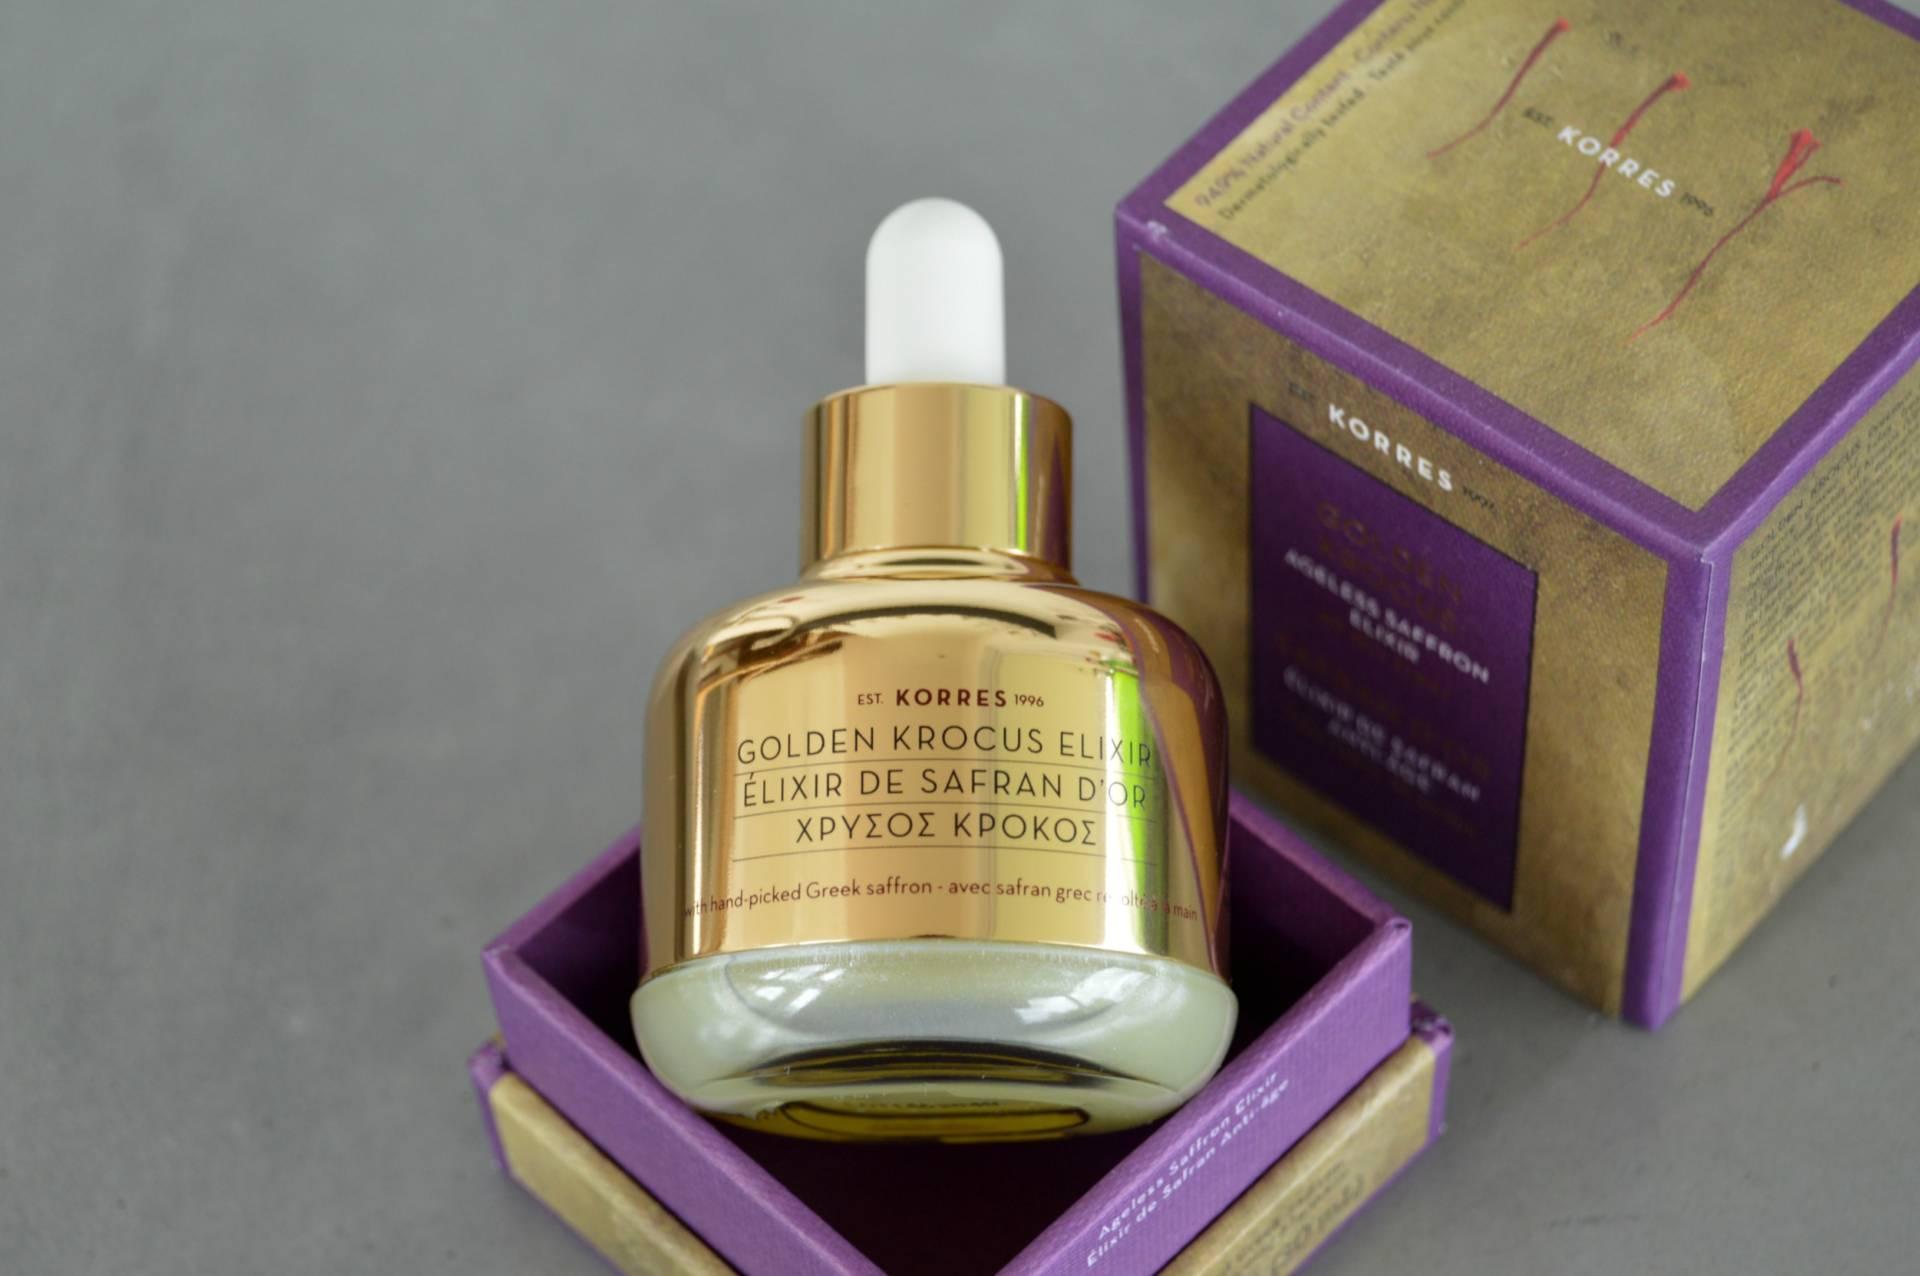 Korres Golden Krocus Ageless Saffron Elixir Omgbart